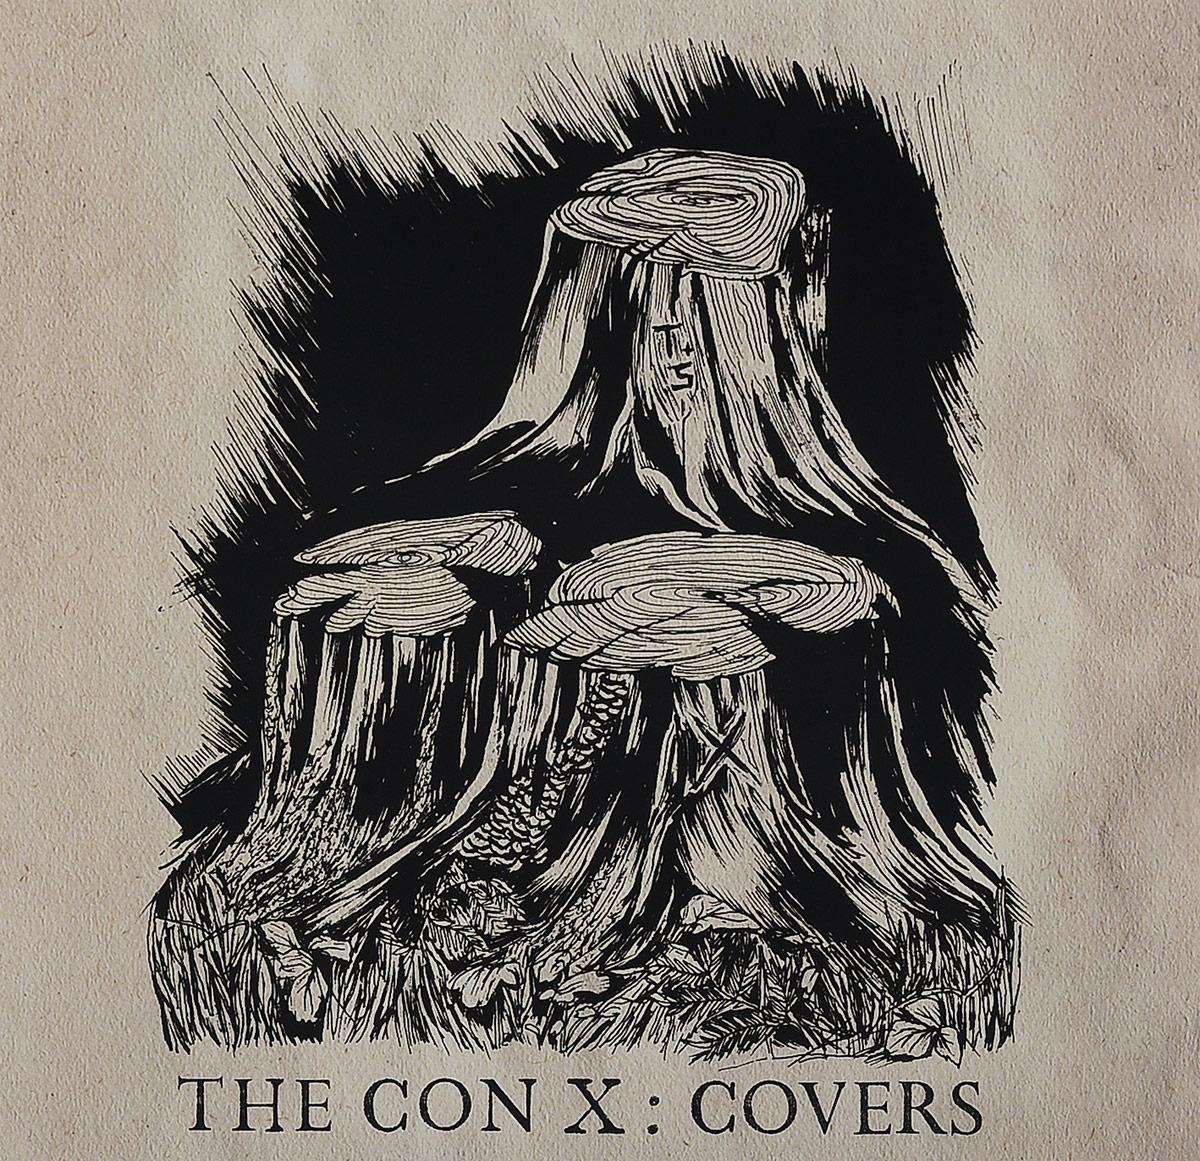 Tegan,Sara Tegan And Sara. The Con X: Covers (LP) цена и фото